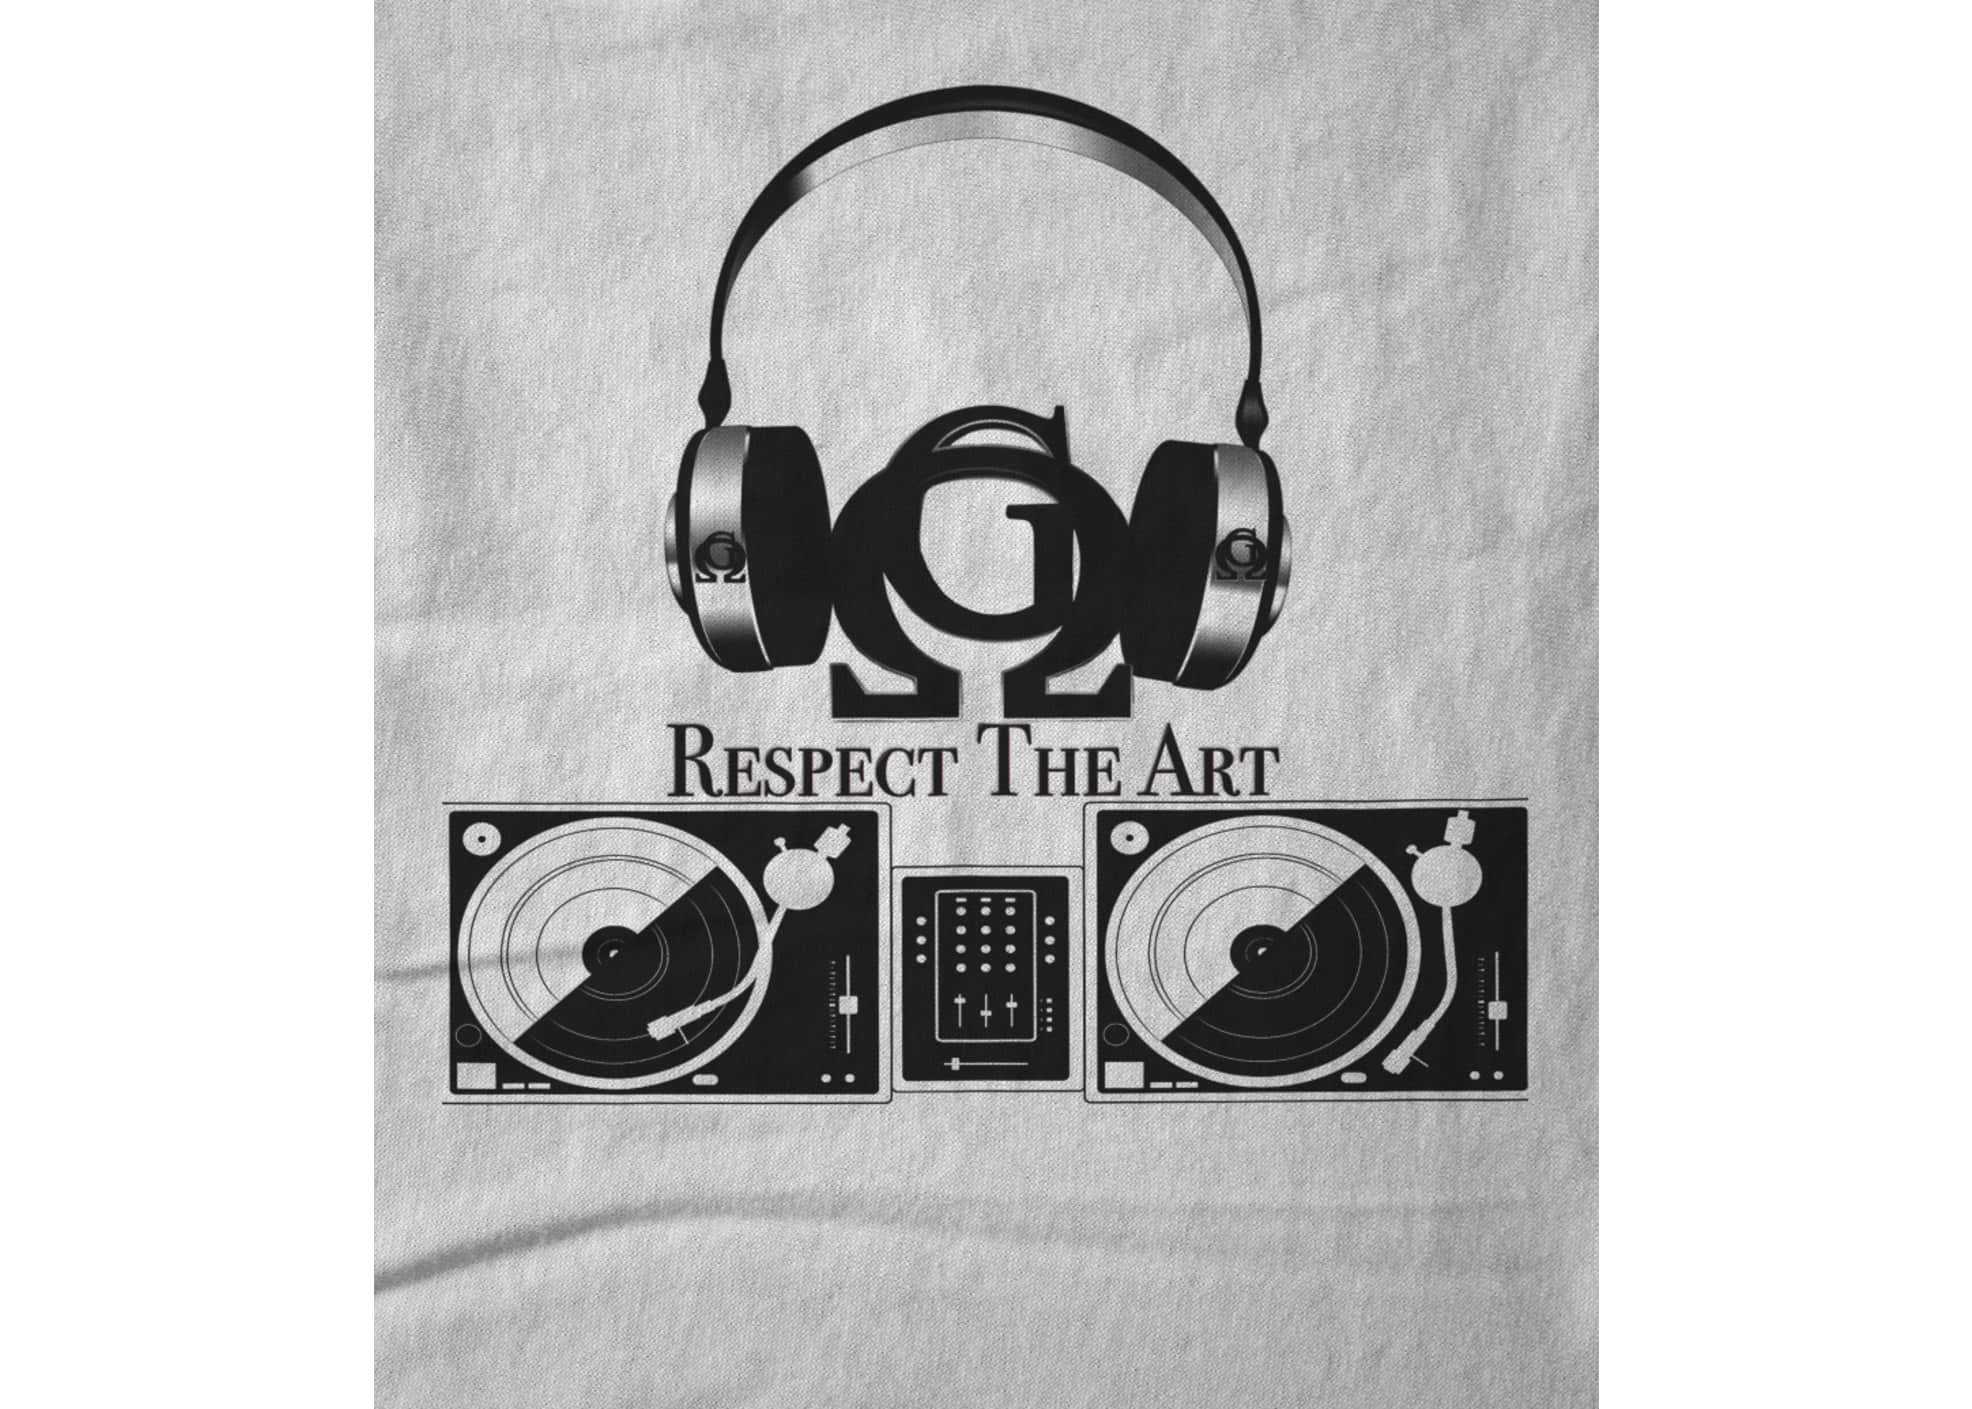 Genesis omega productions respect the art wht 1495321377